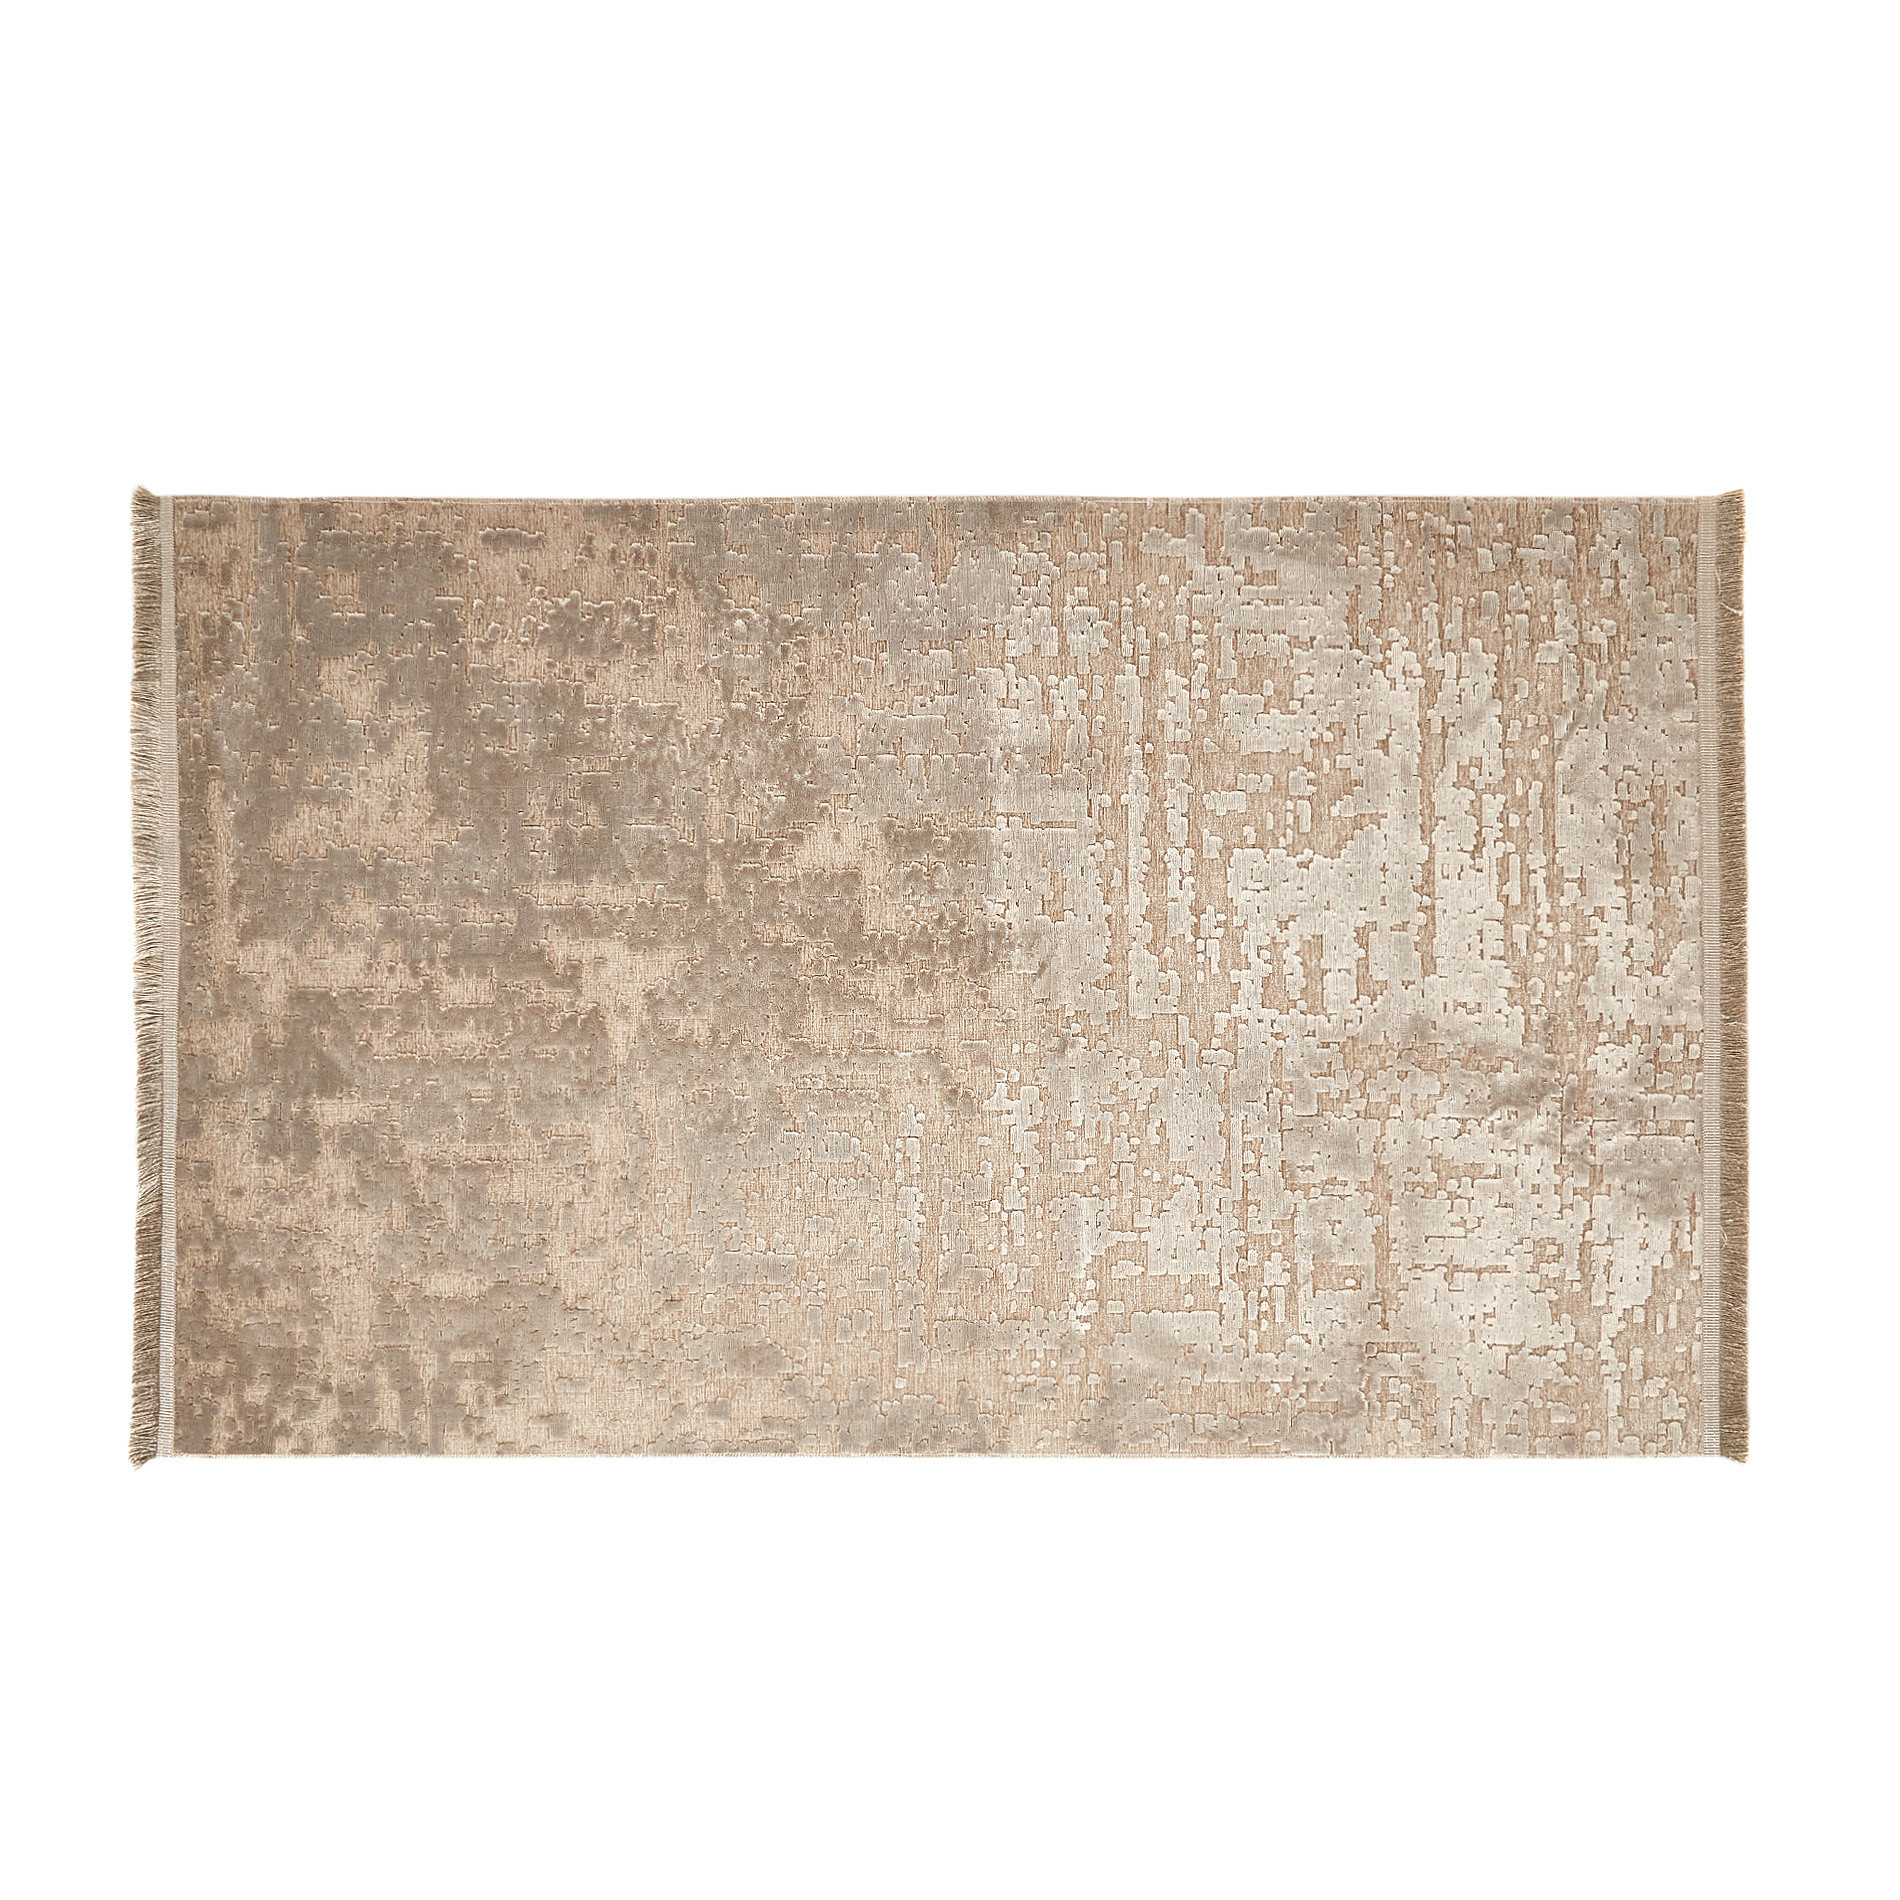 Tappeto motivo ornamentale, Beige, large image number 0